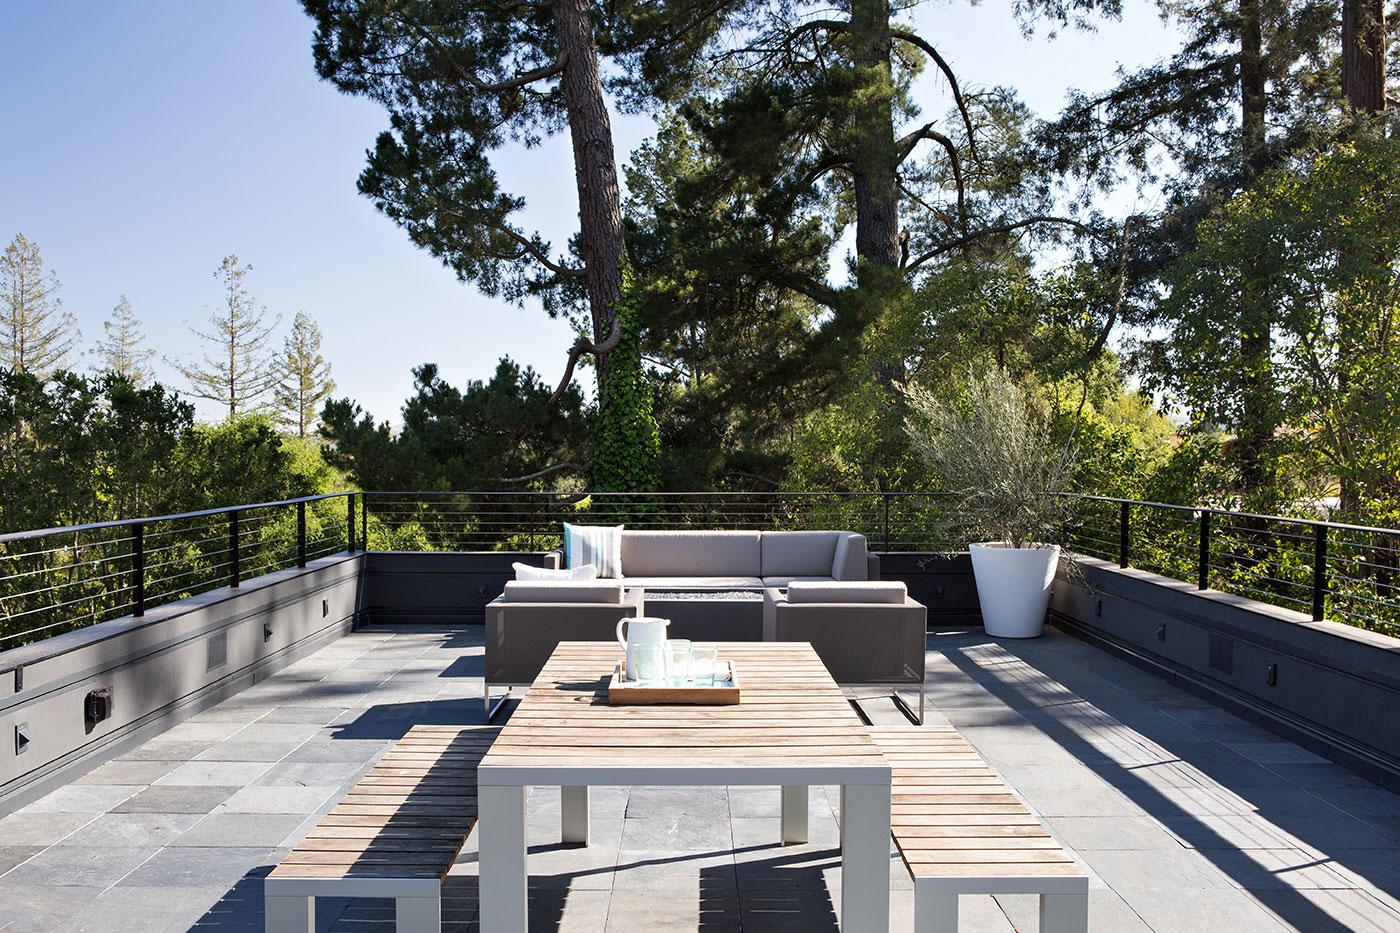 Minimal Modern Addition Home with Dark Grey Stuccoed Walls by Klopf Architecture-04